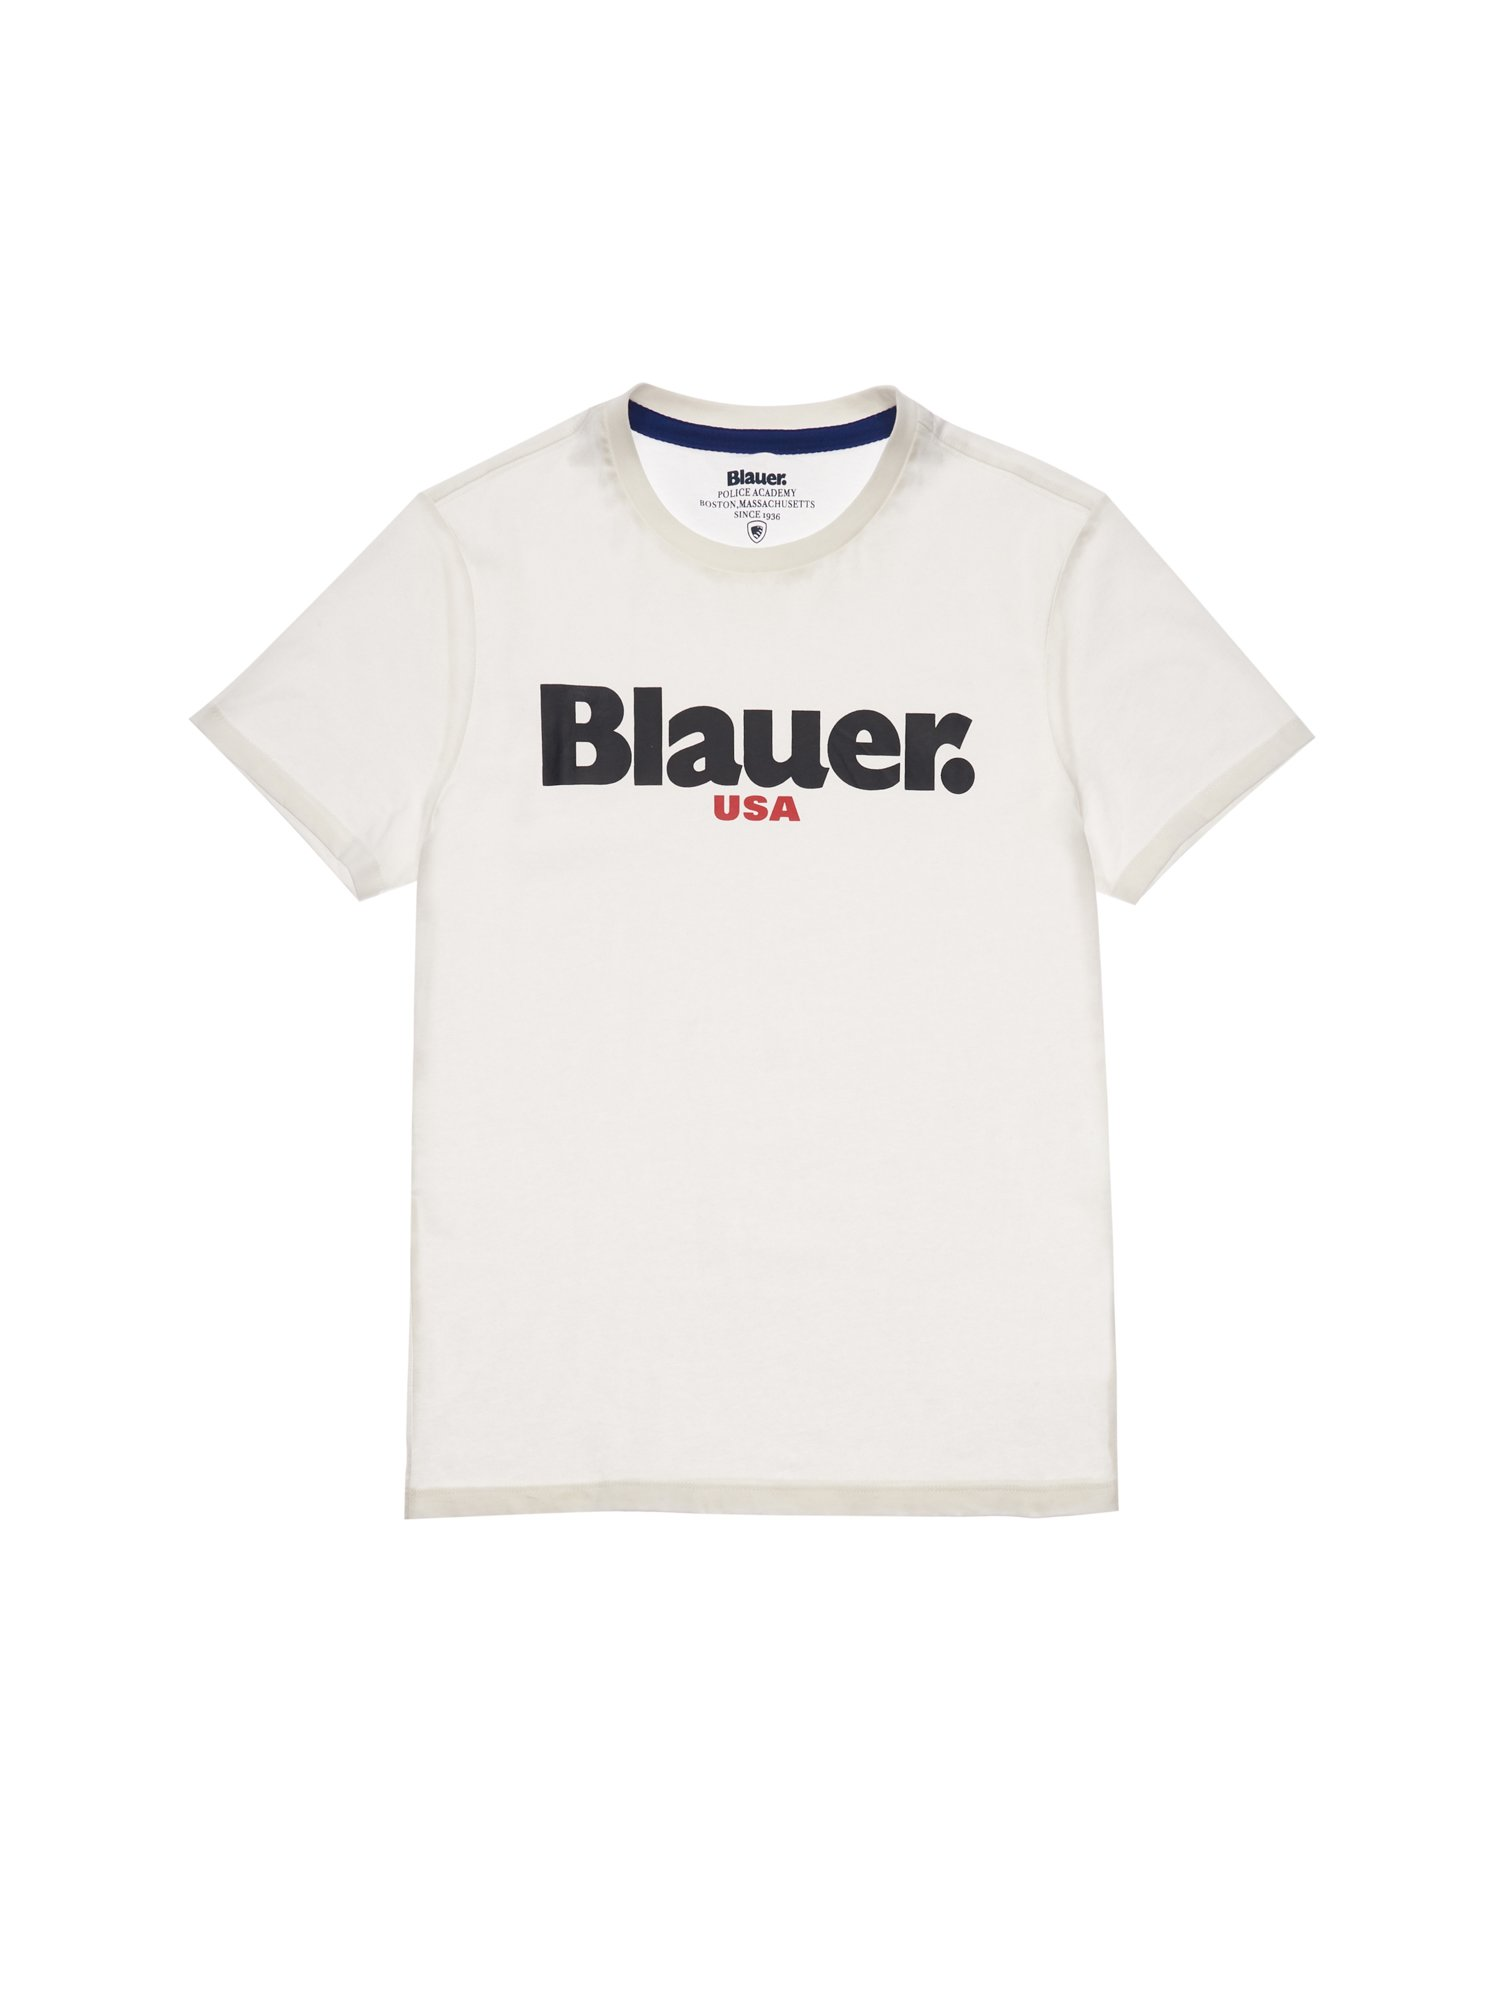 ФУТБОЛКА МУЖСКАЯ BLAUER USA - Blauer